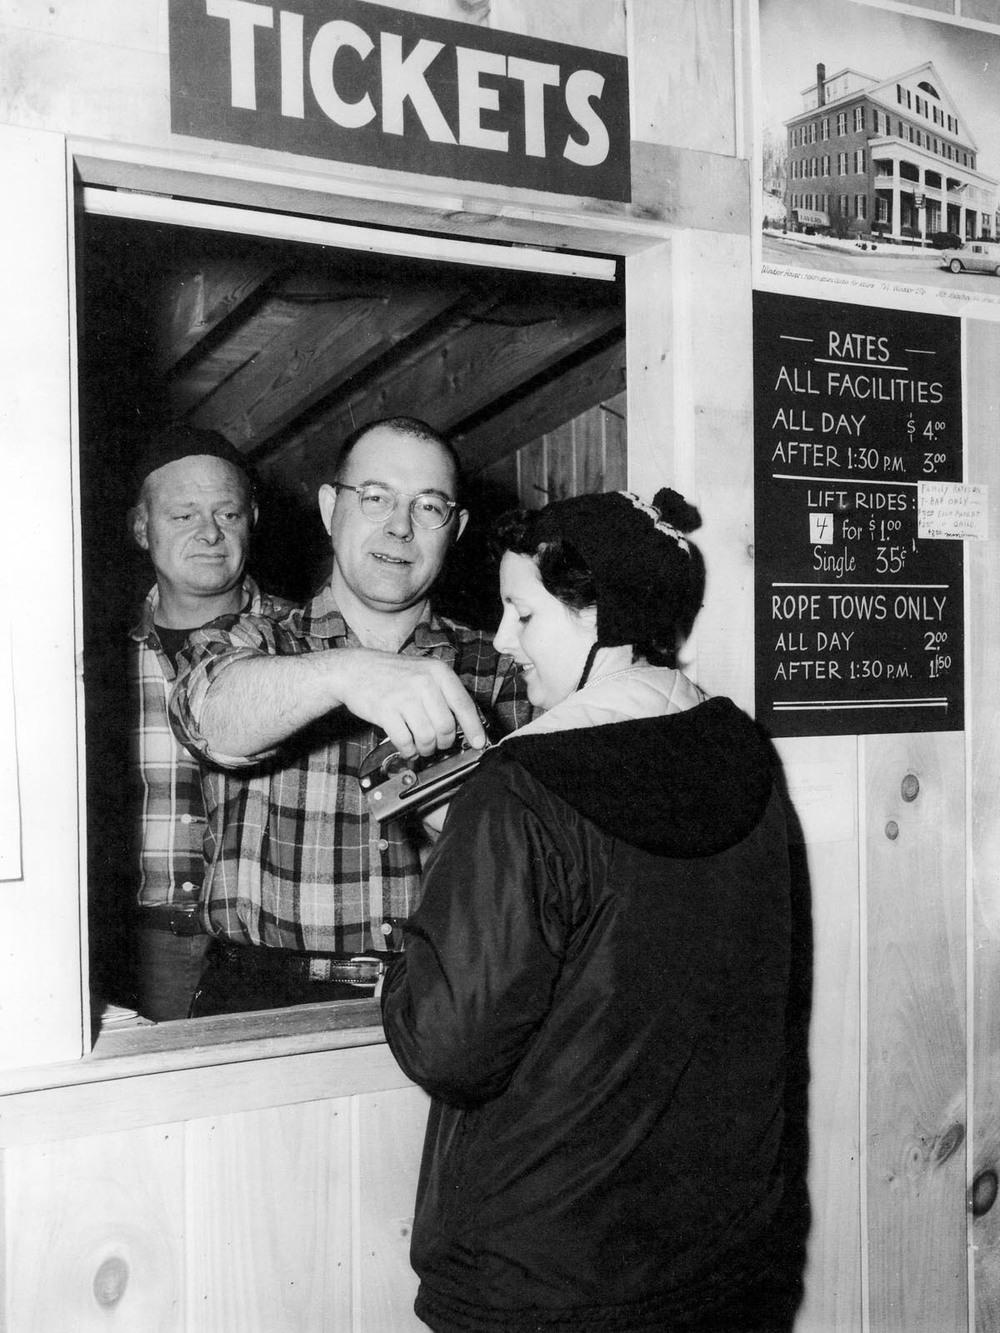 Bob Ely, Jim Howland, Mary Harriman 4 lift rides $1